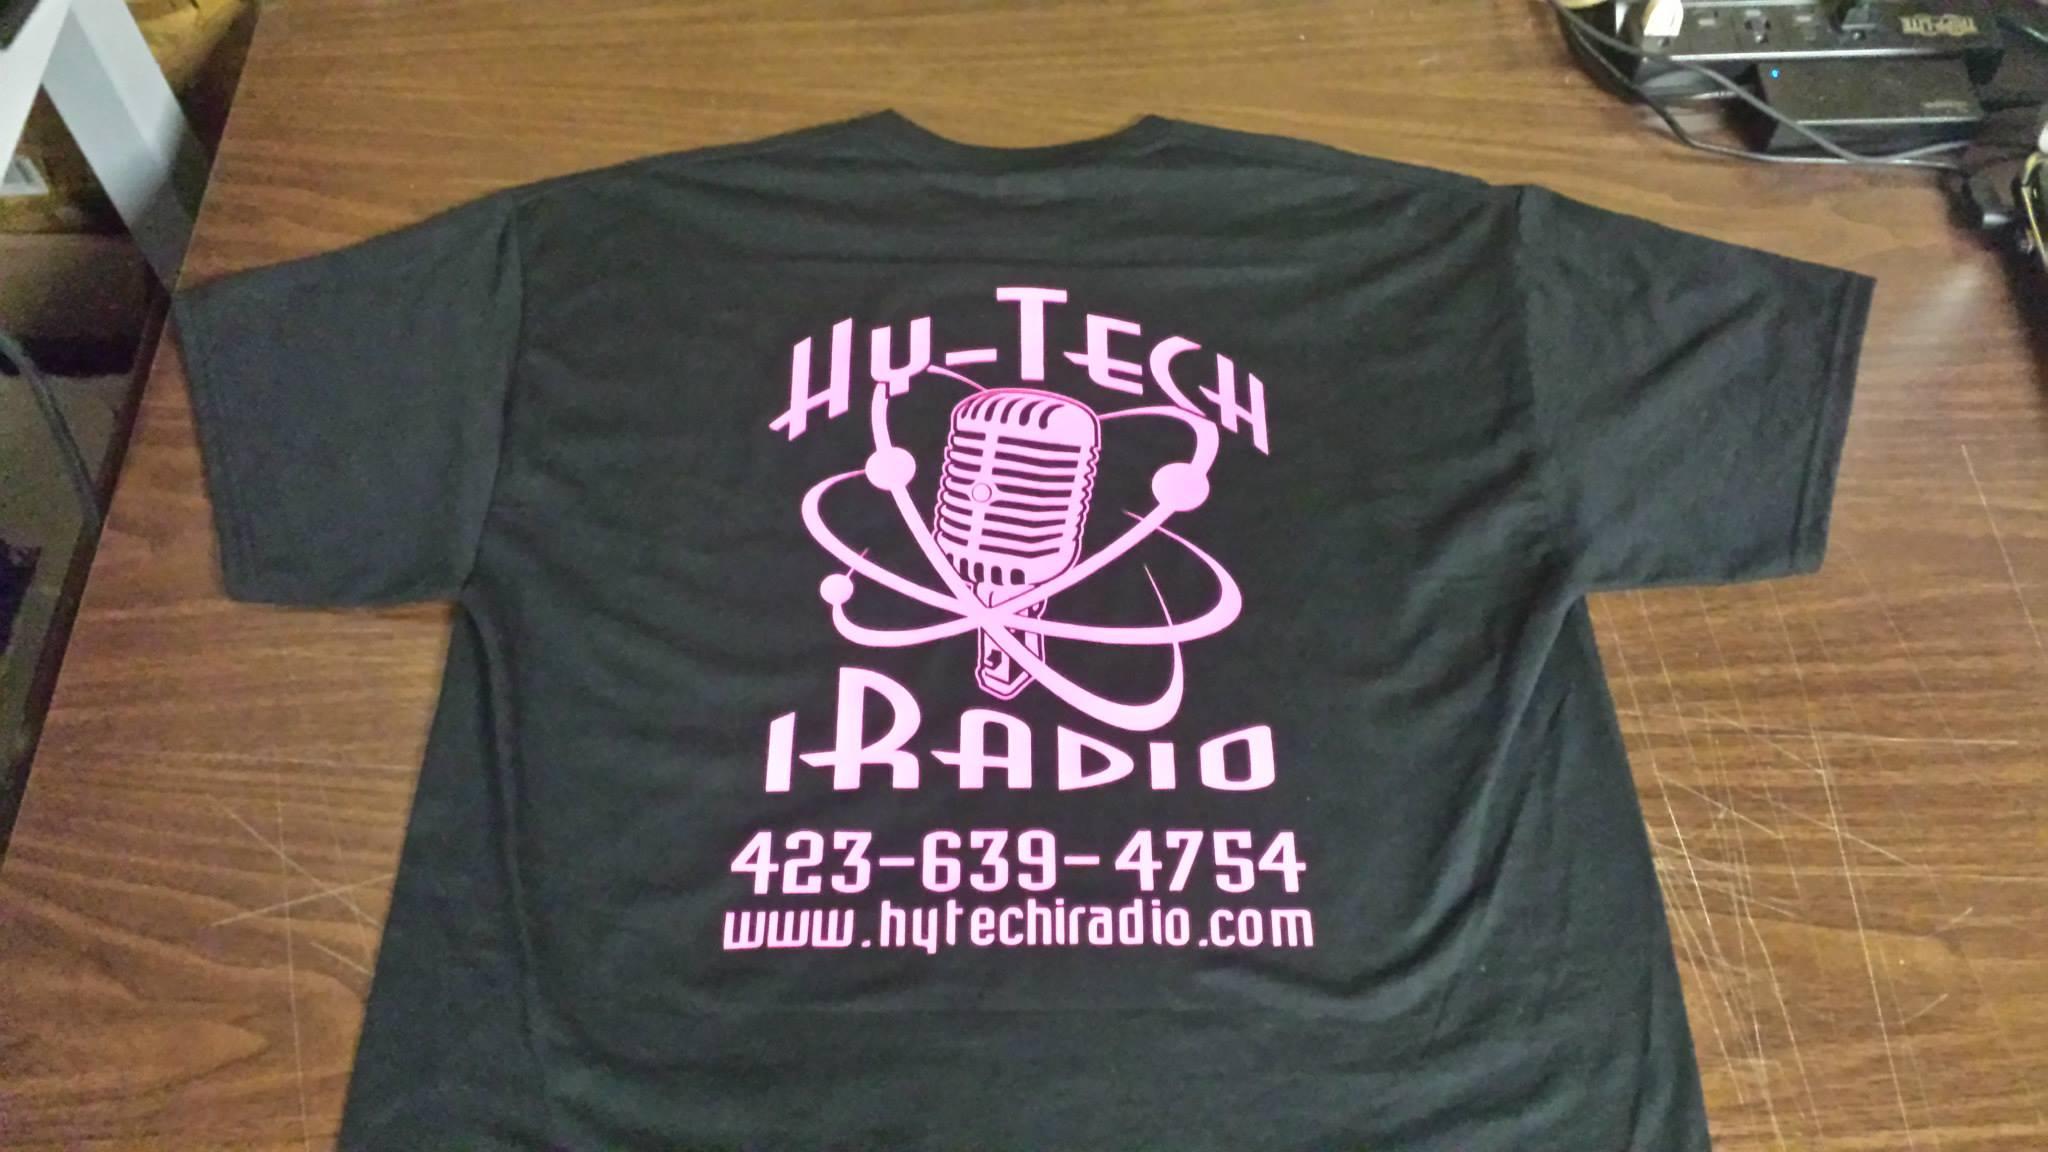 Hy-Tech iRadio